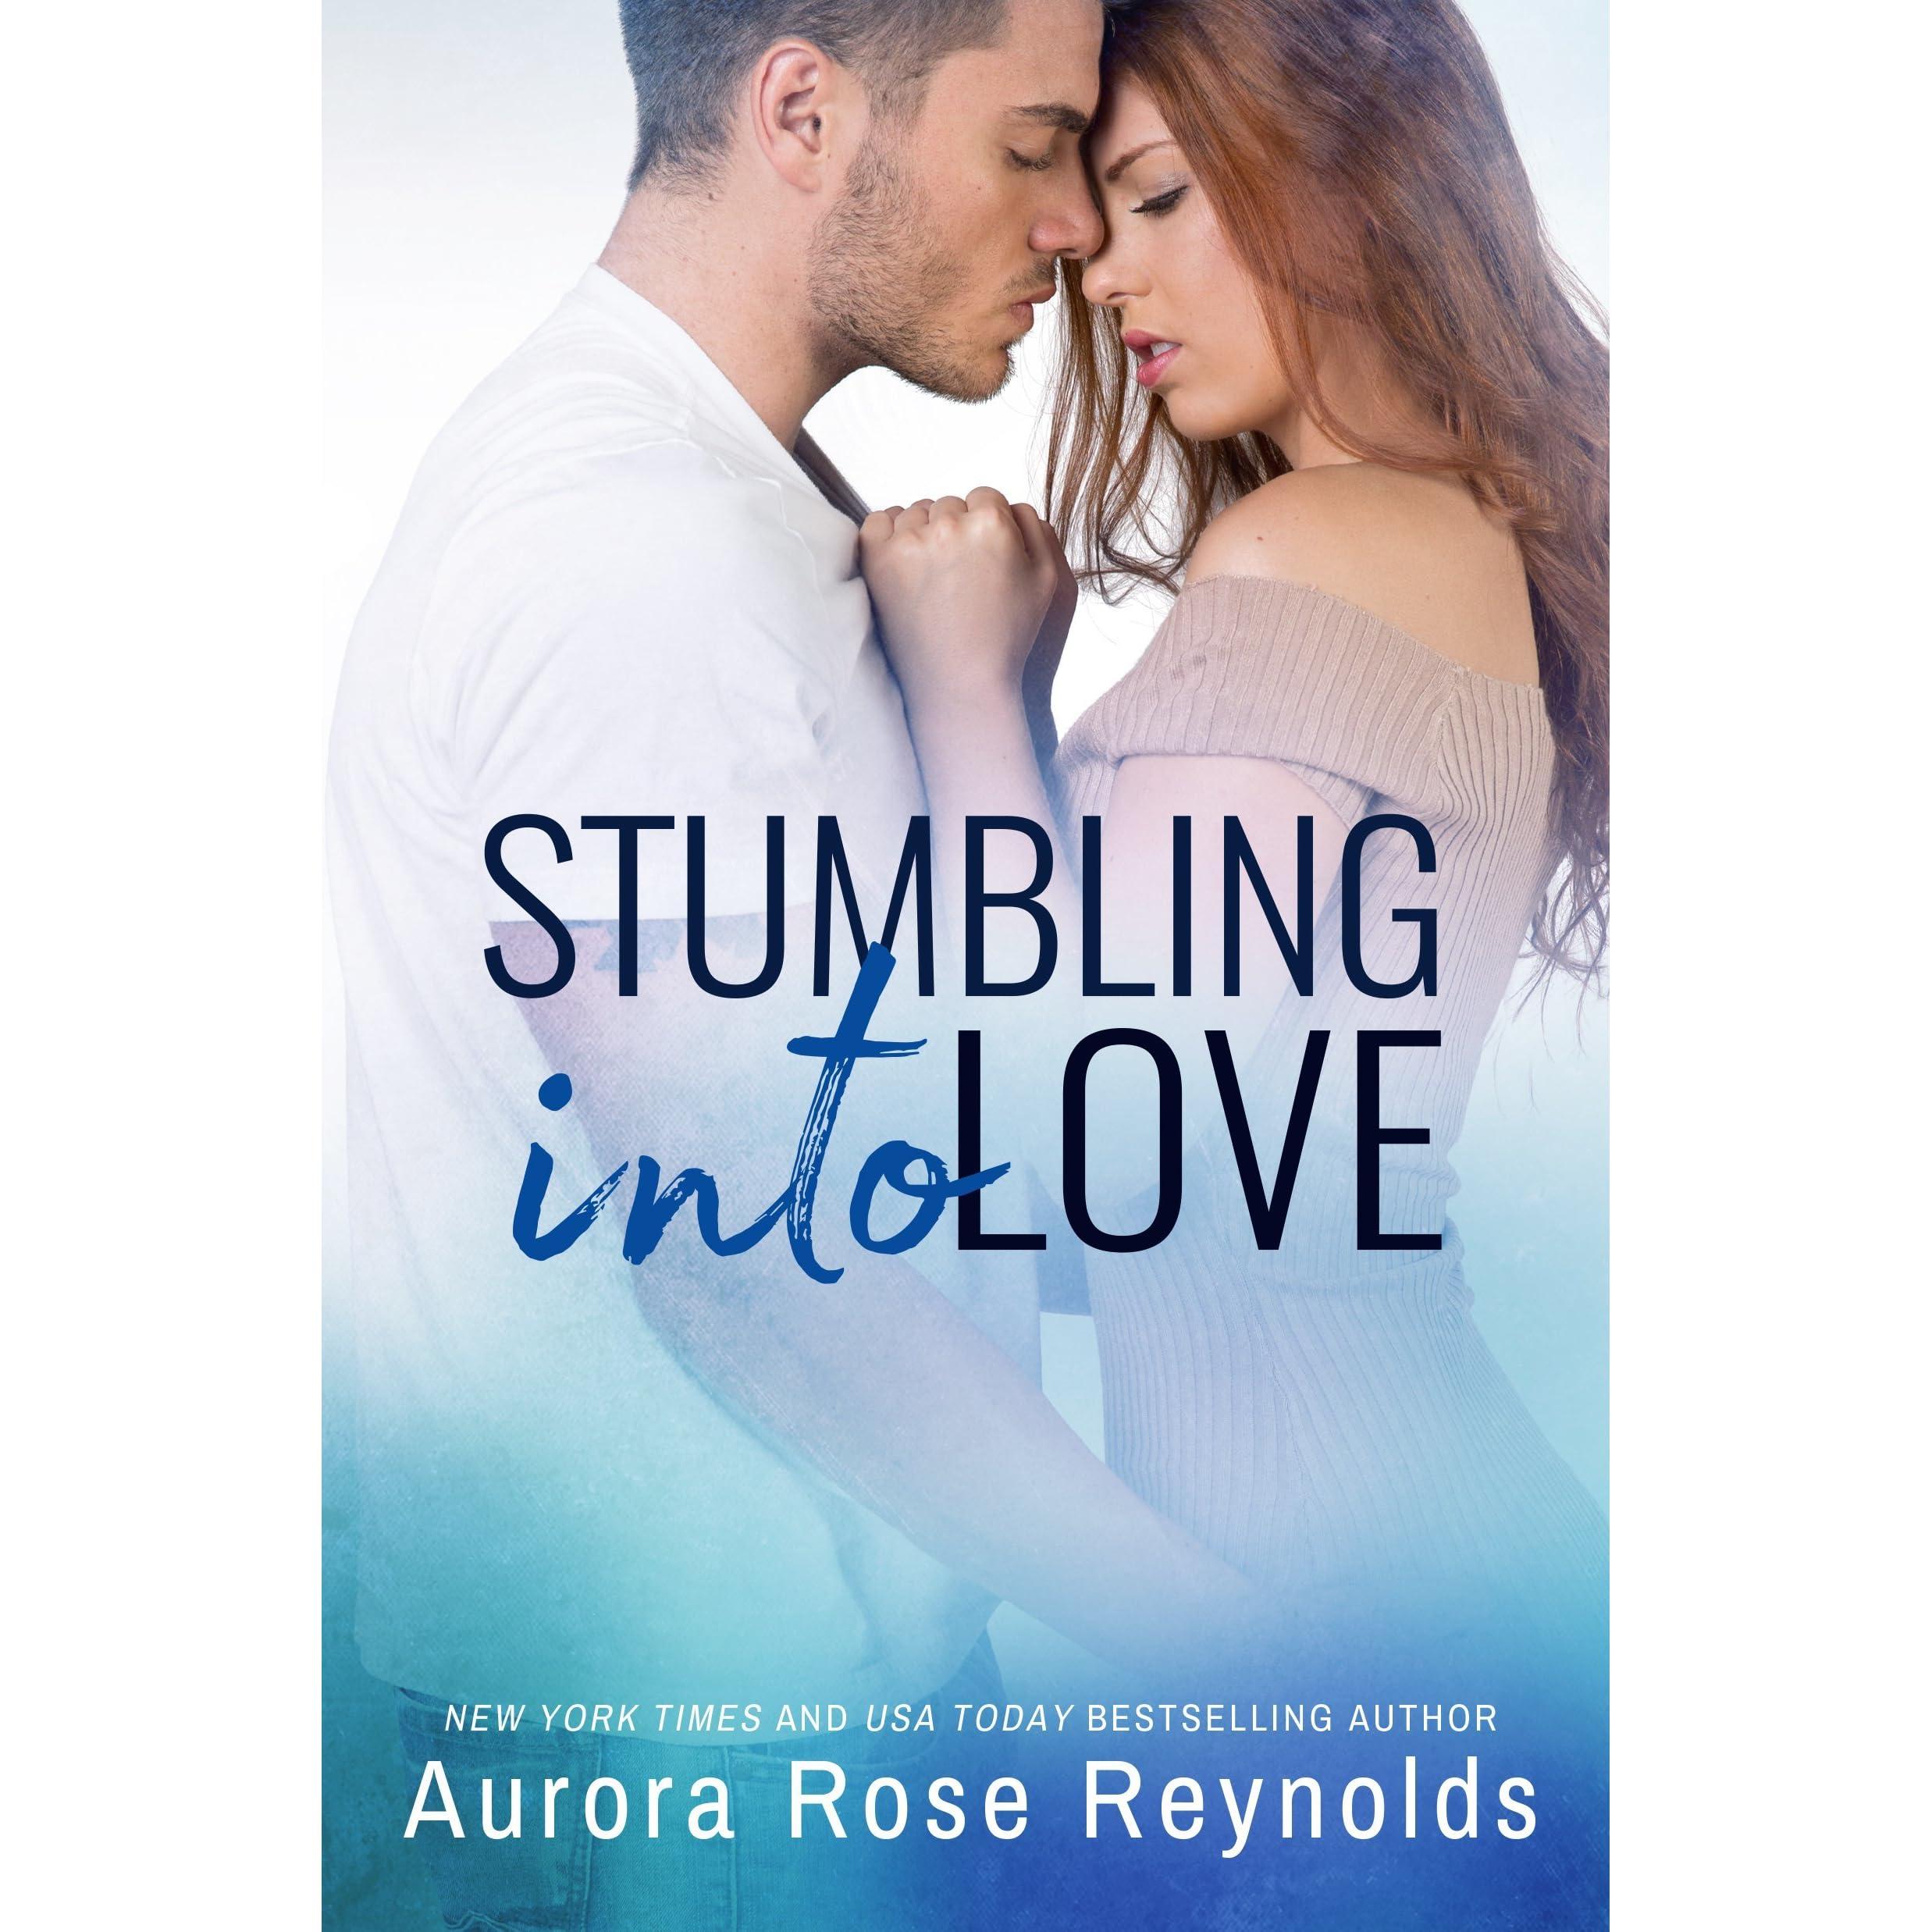 Stumbling into Love (Fluke My Life, #2) by Aurora Rose Reynolds